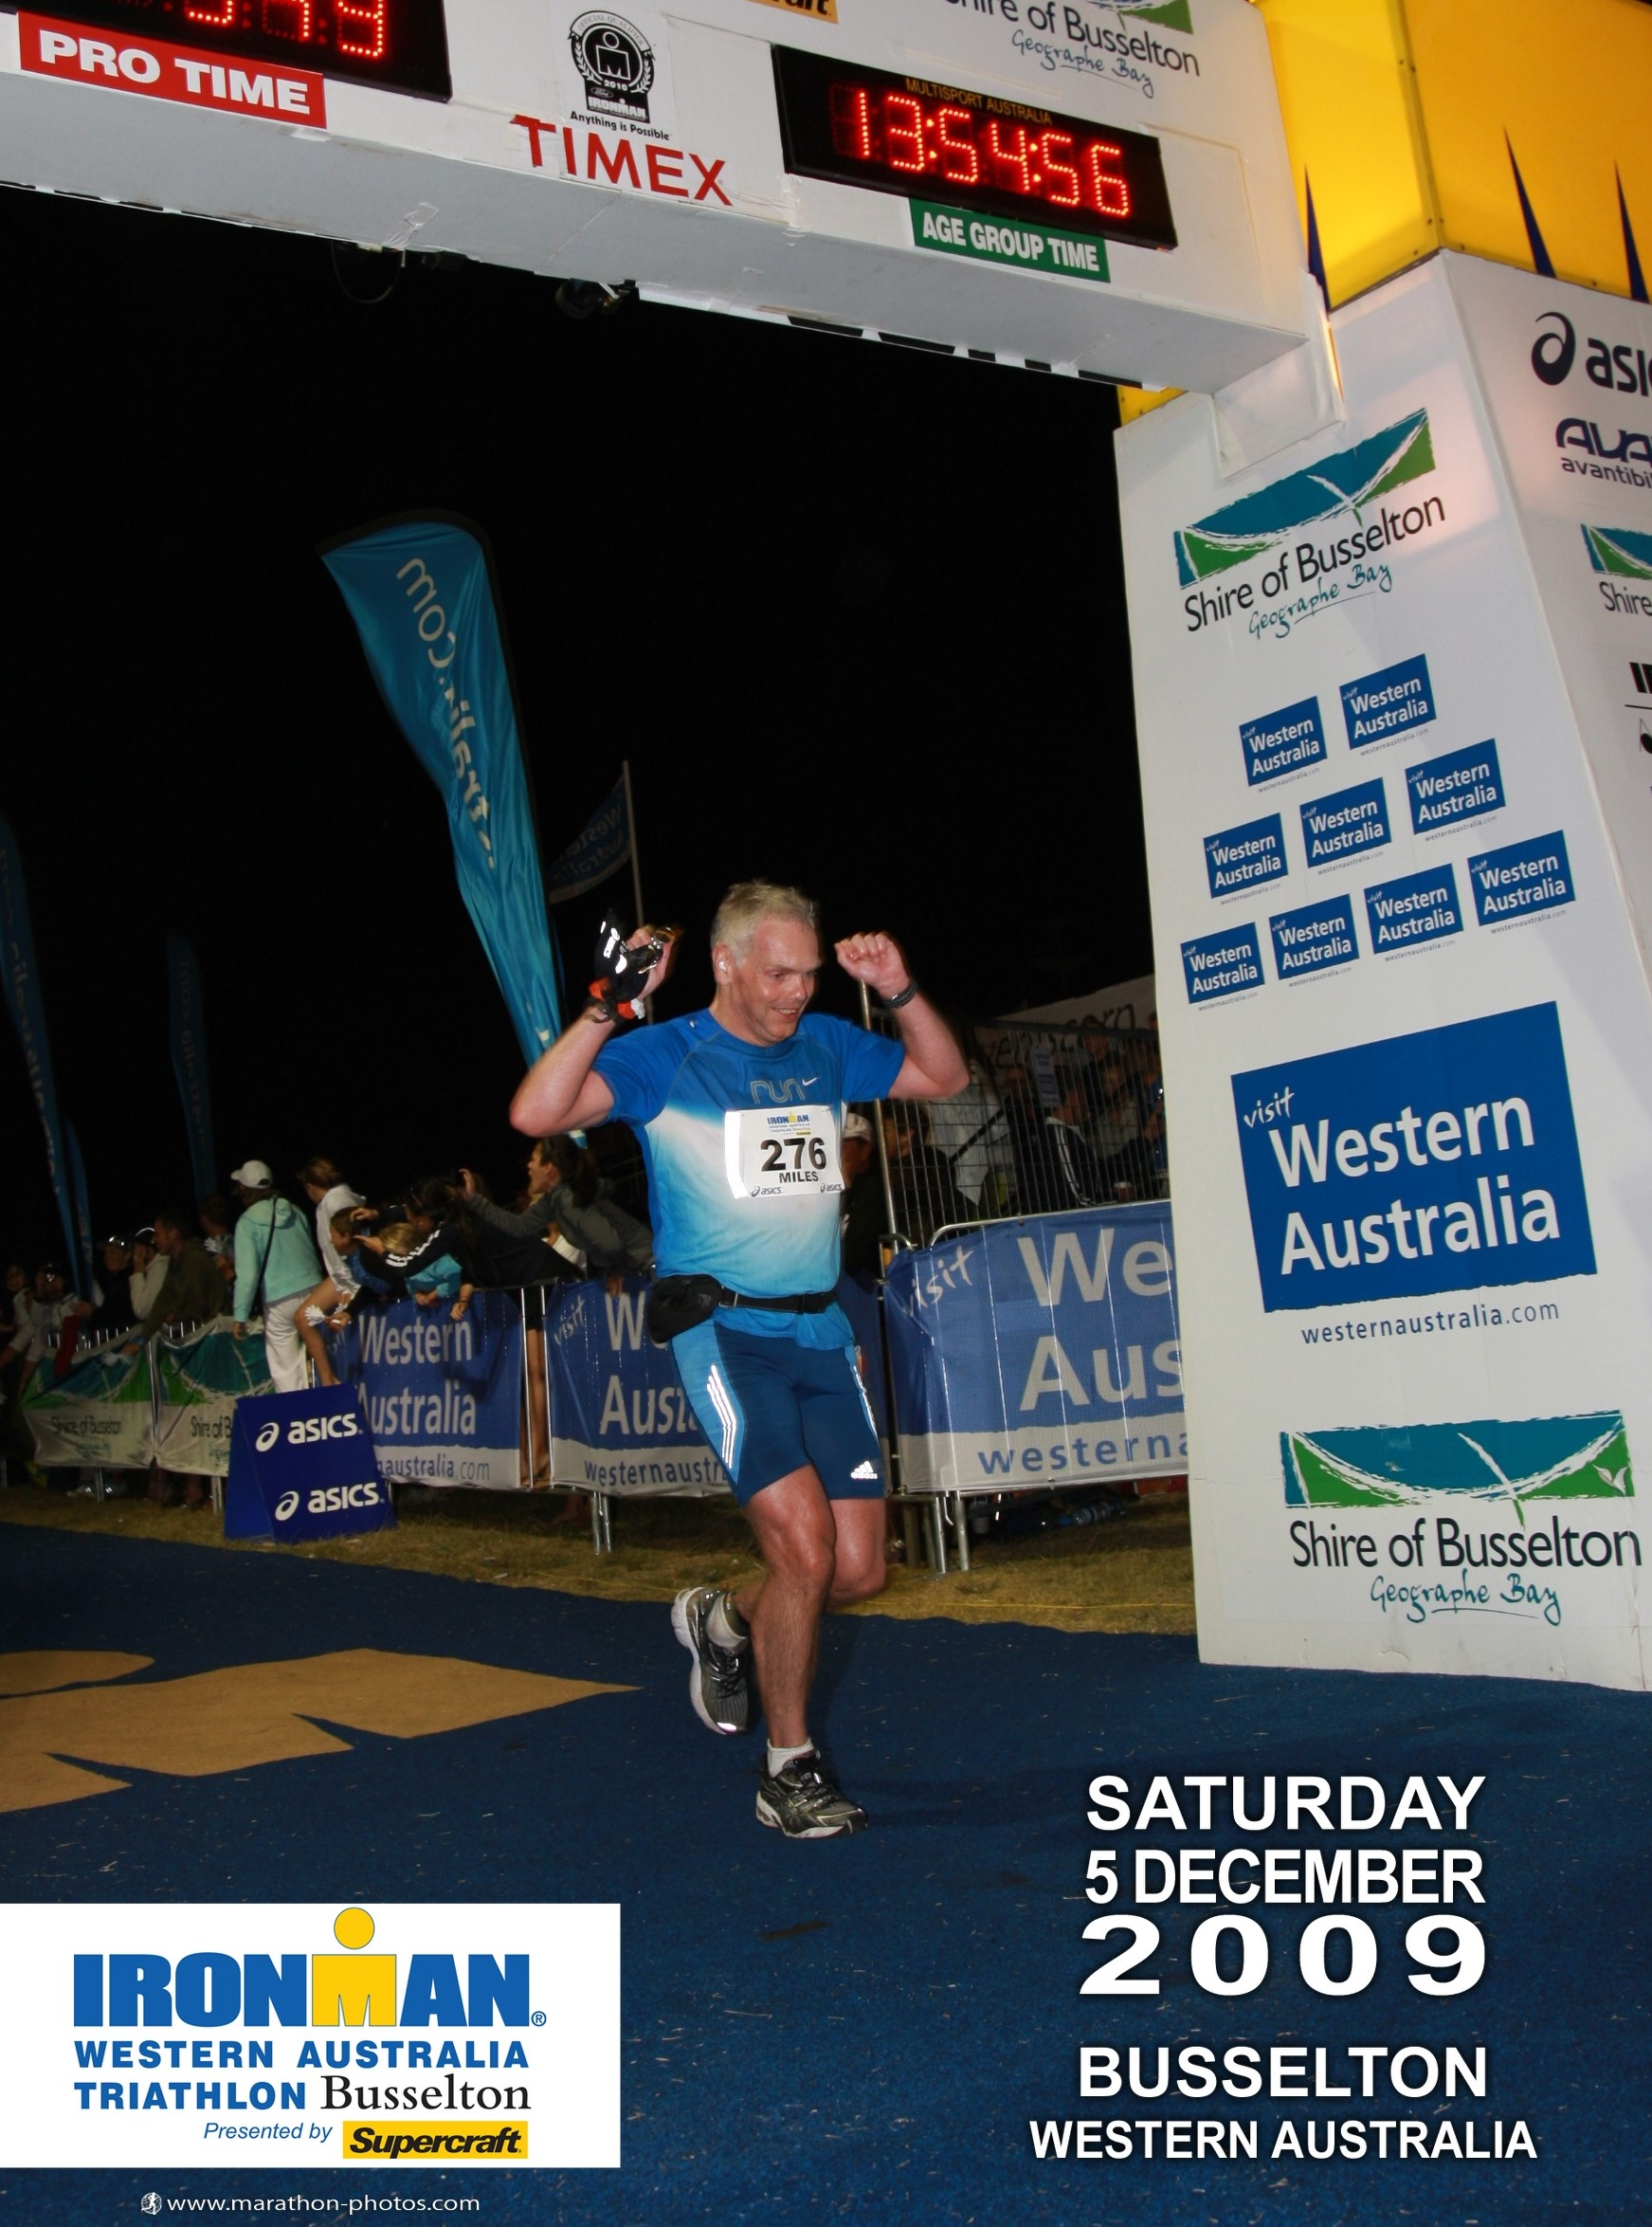 Western Australia Ironman